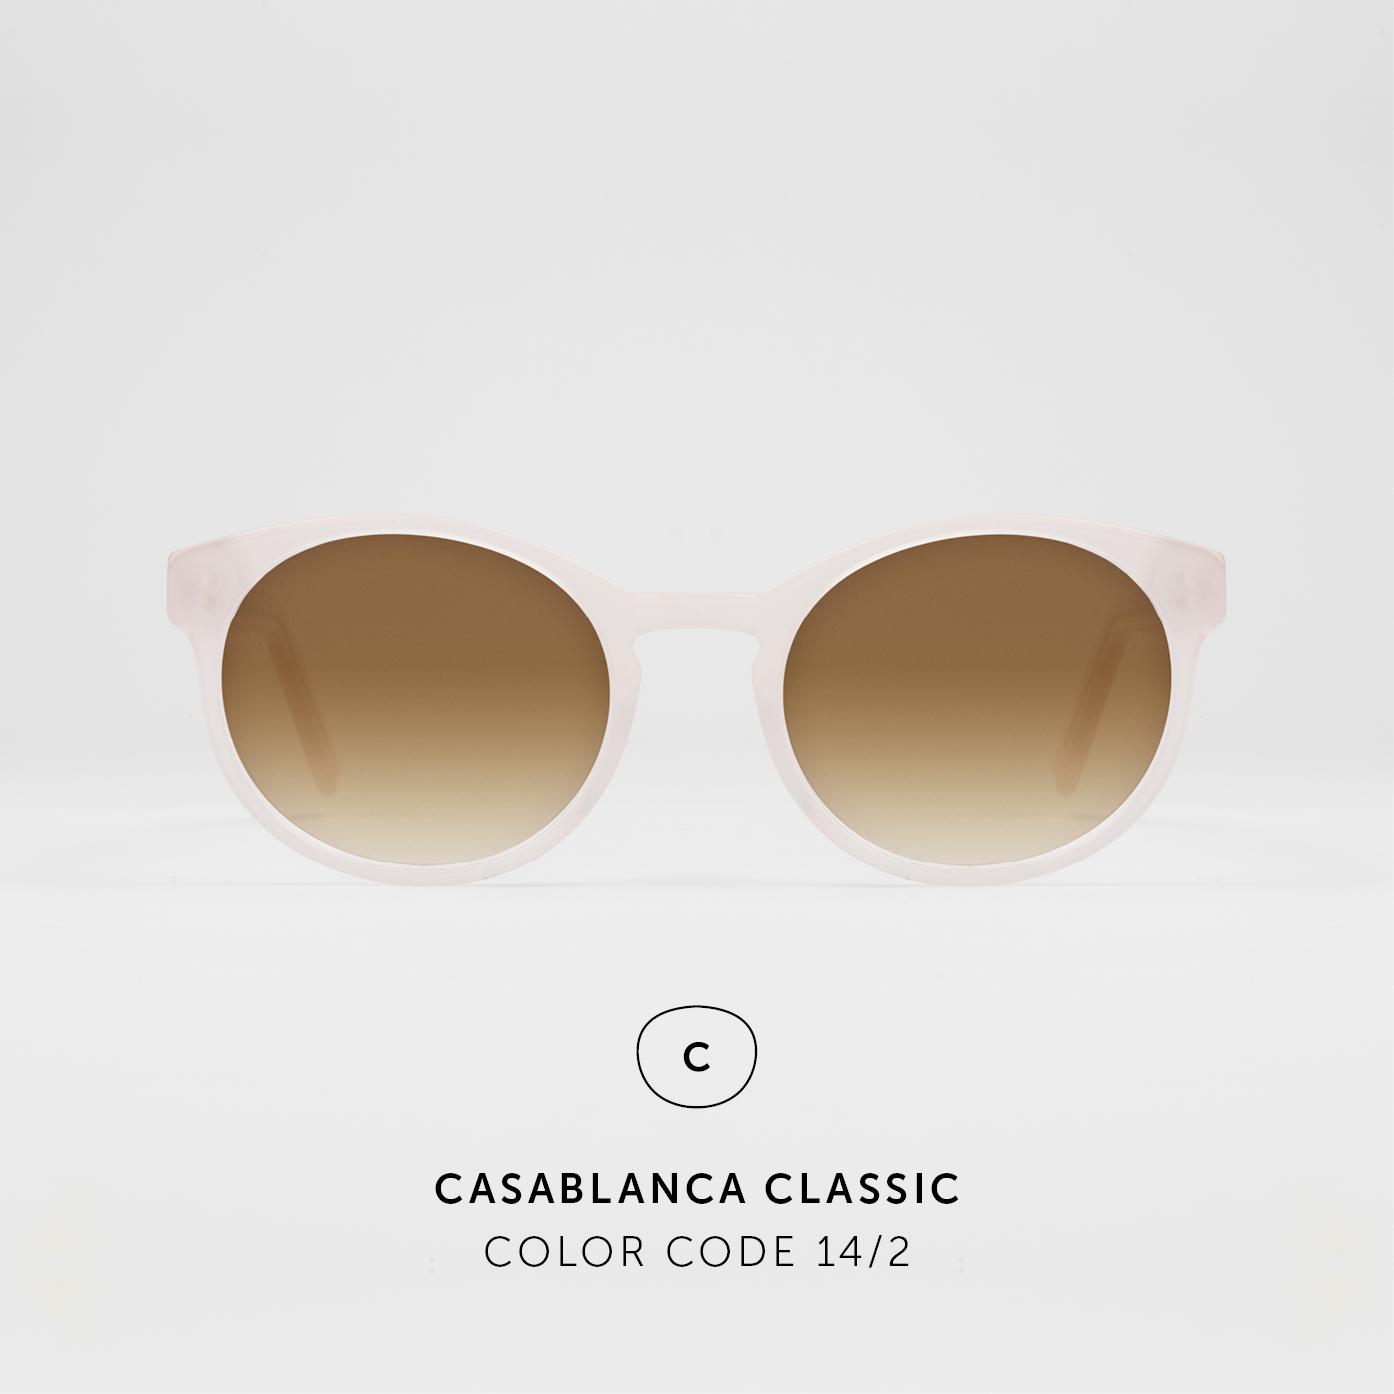 CasablancaClassic35.jpg